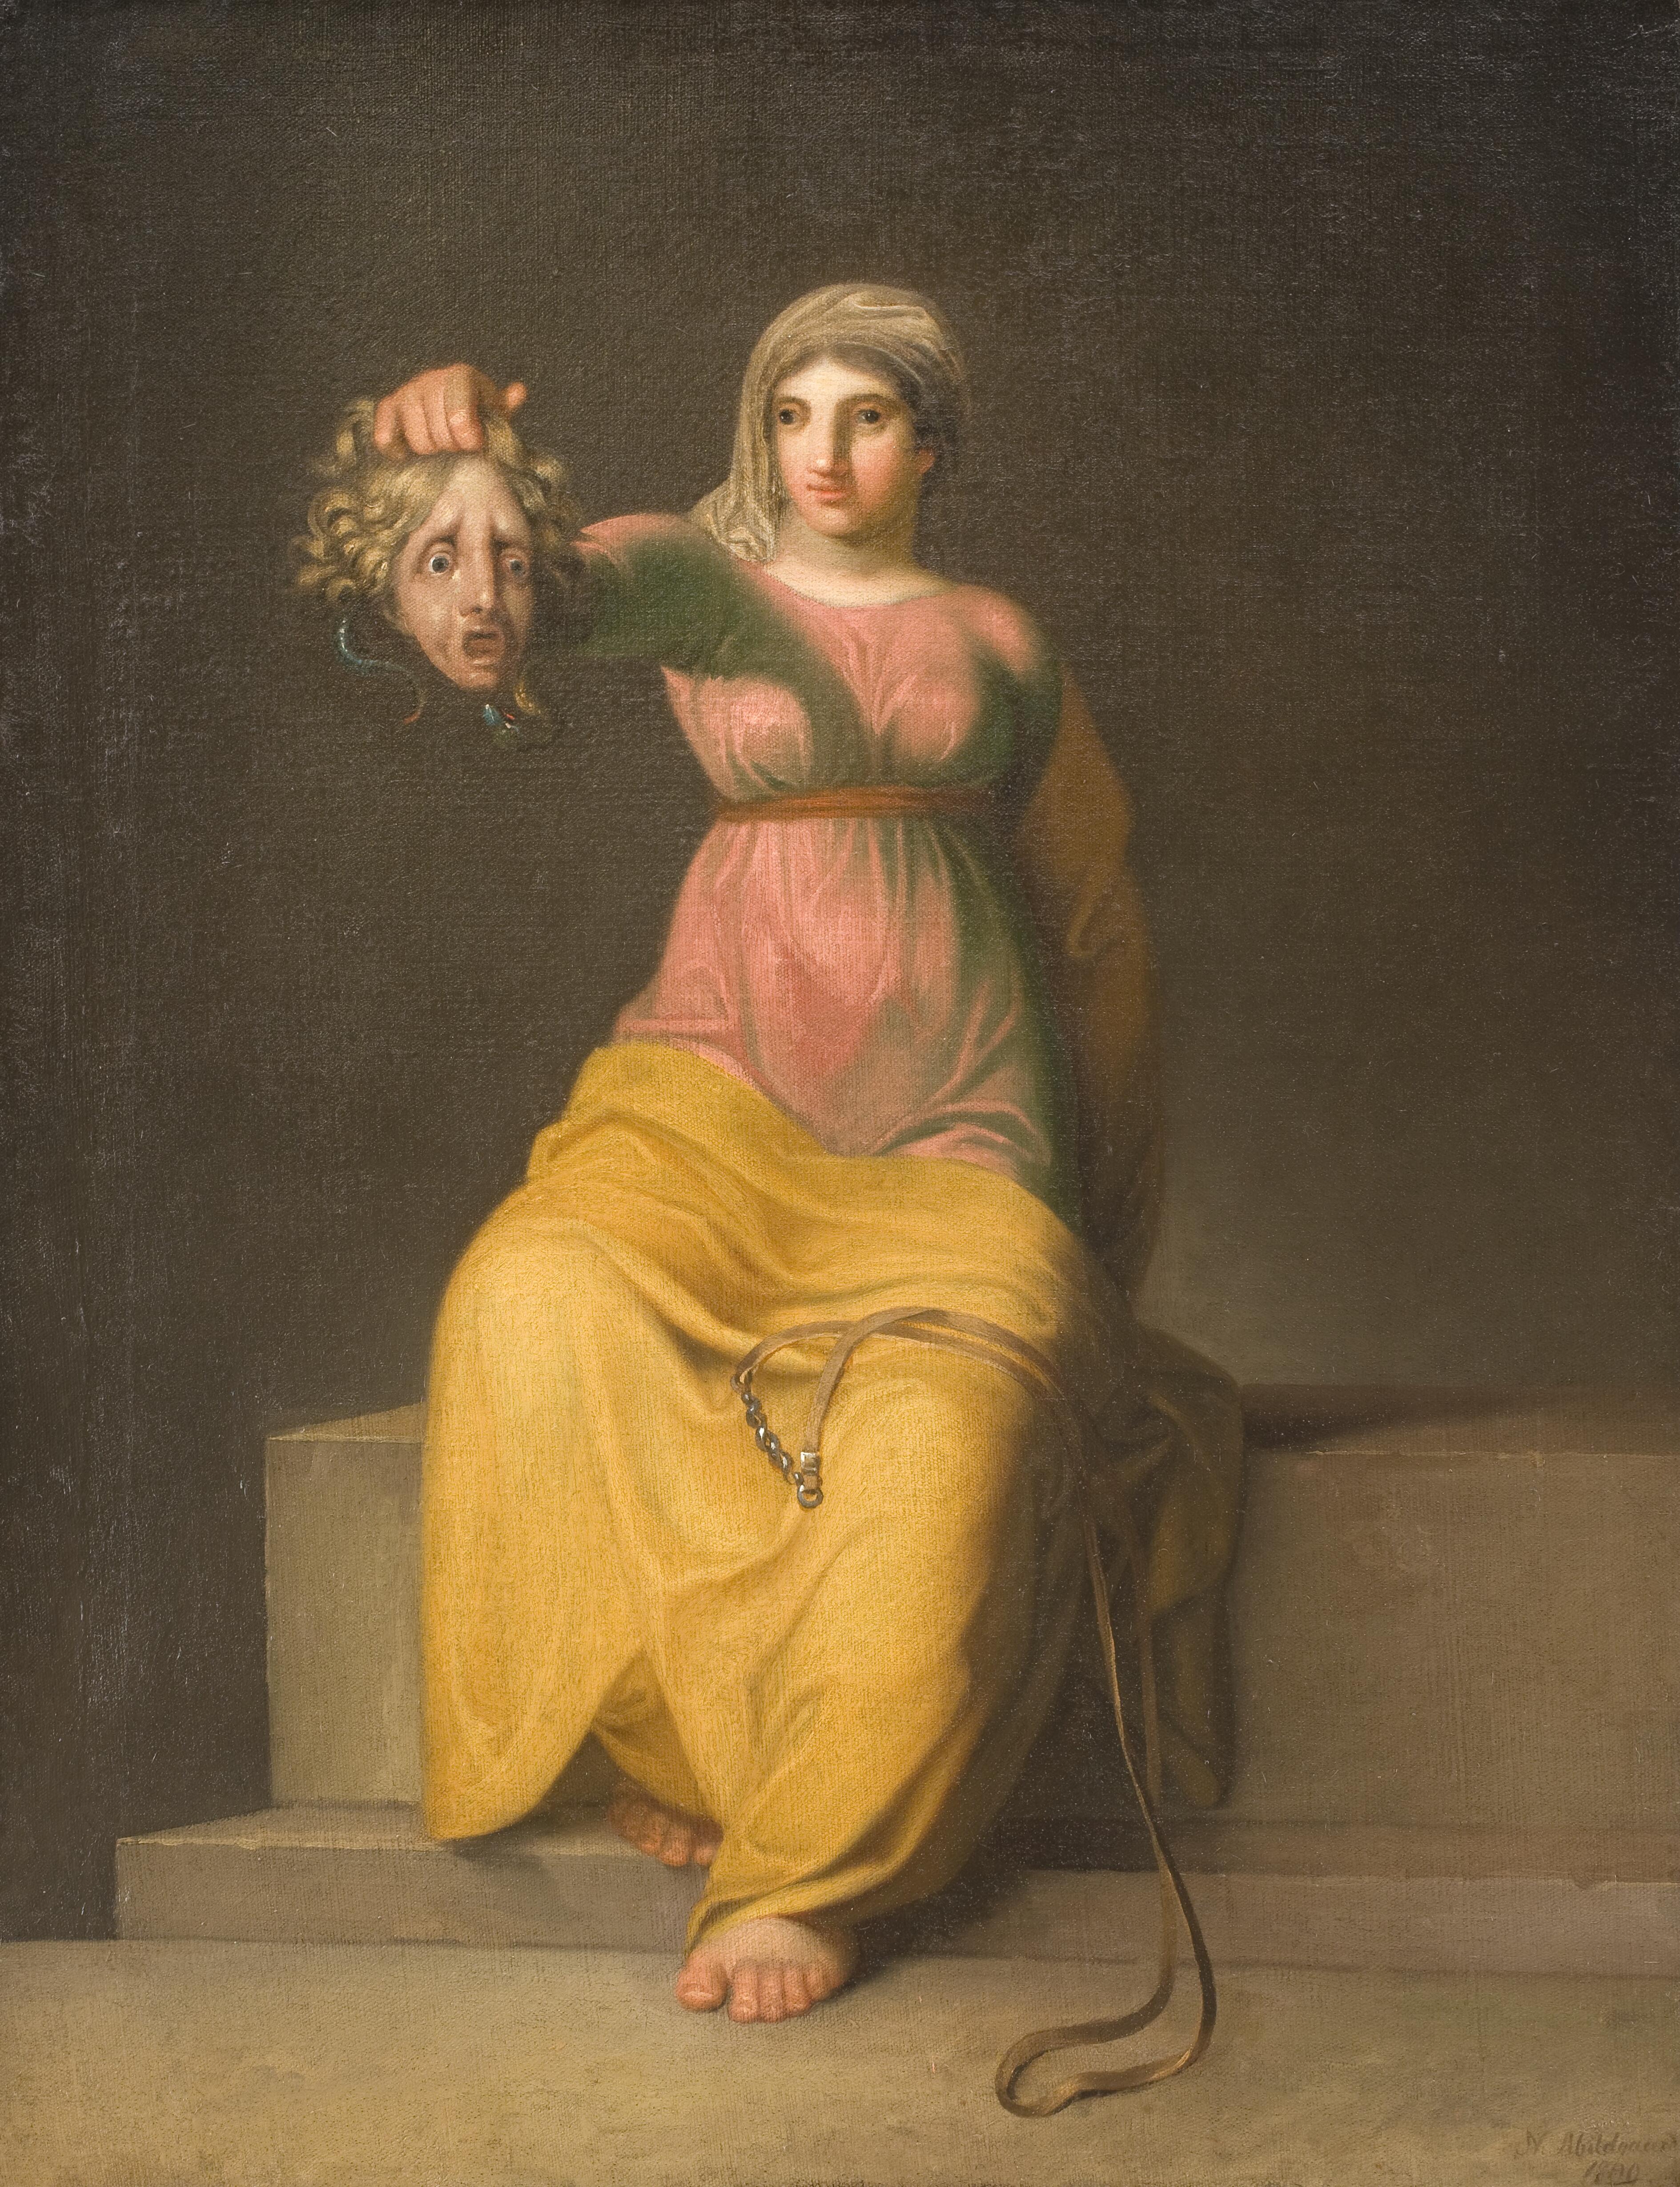 File:Nicolai Abildgaard - Theology. Allegorical figure - KMS3343 - Statens Museum for Kunst.jpg